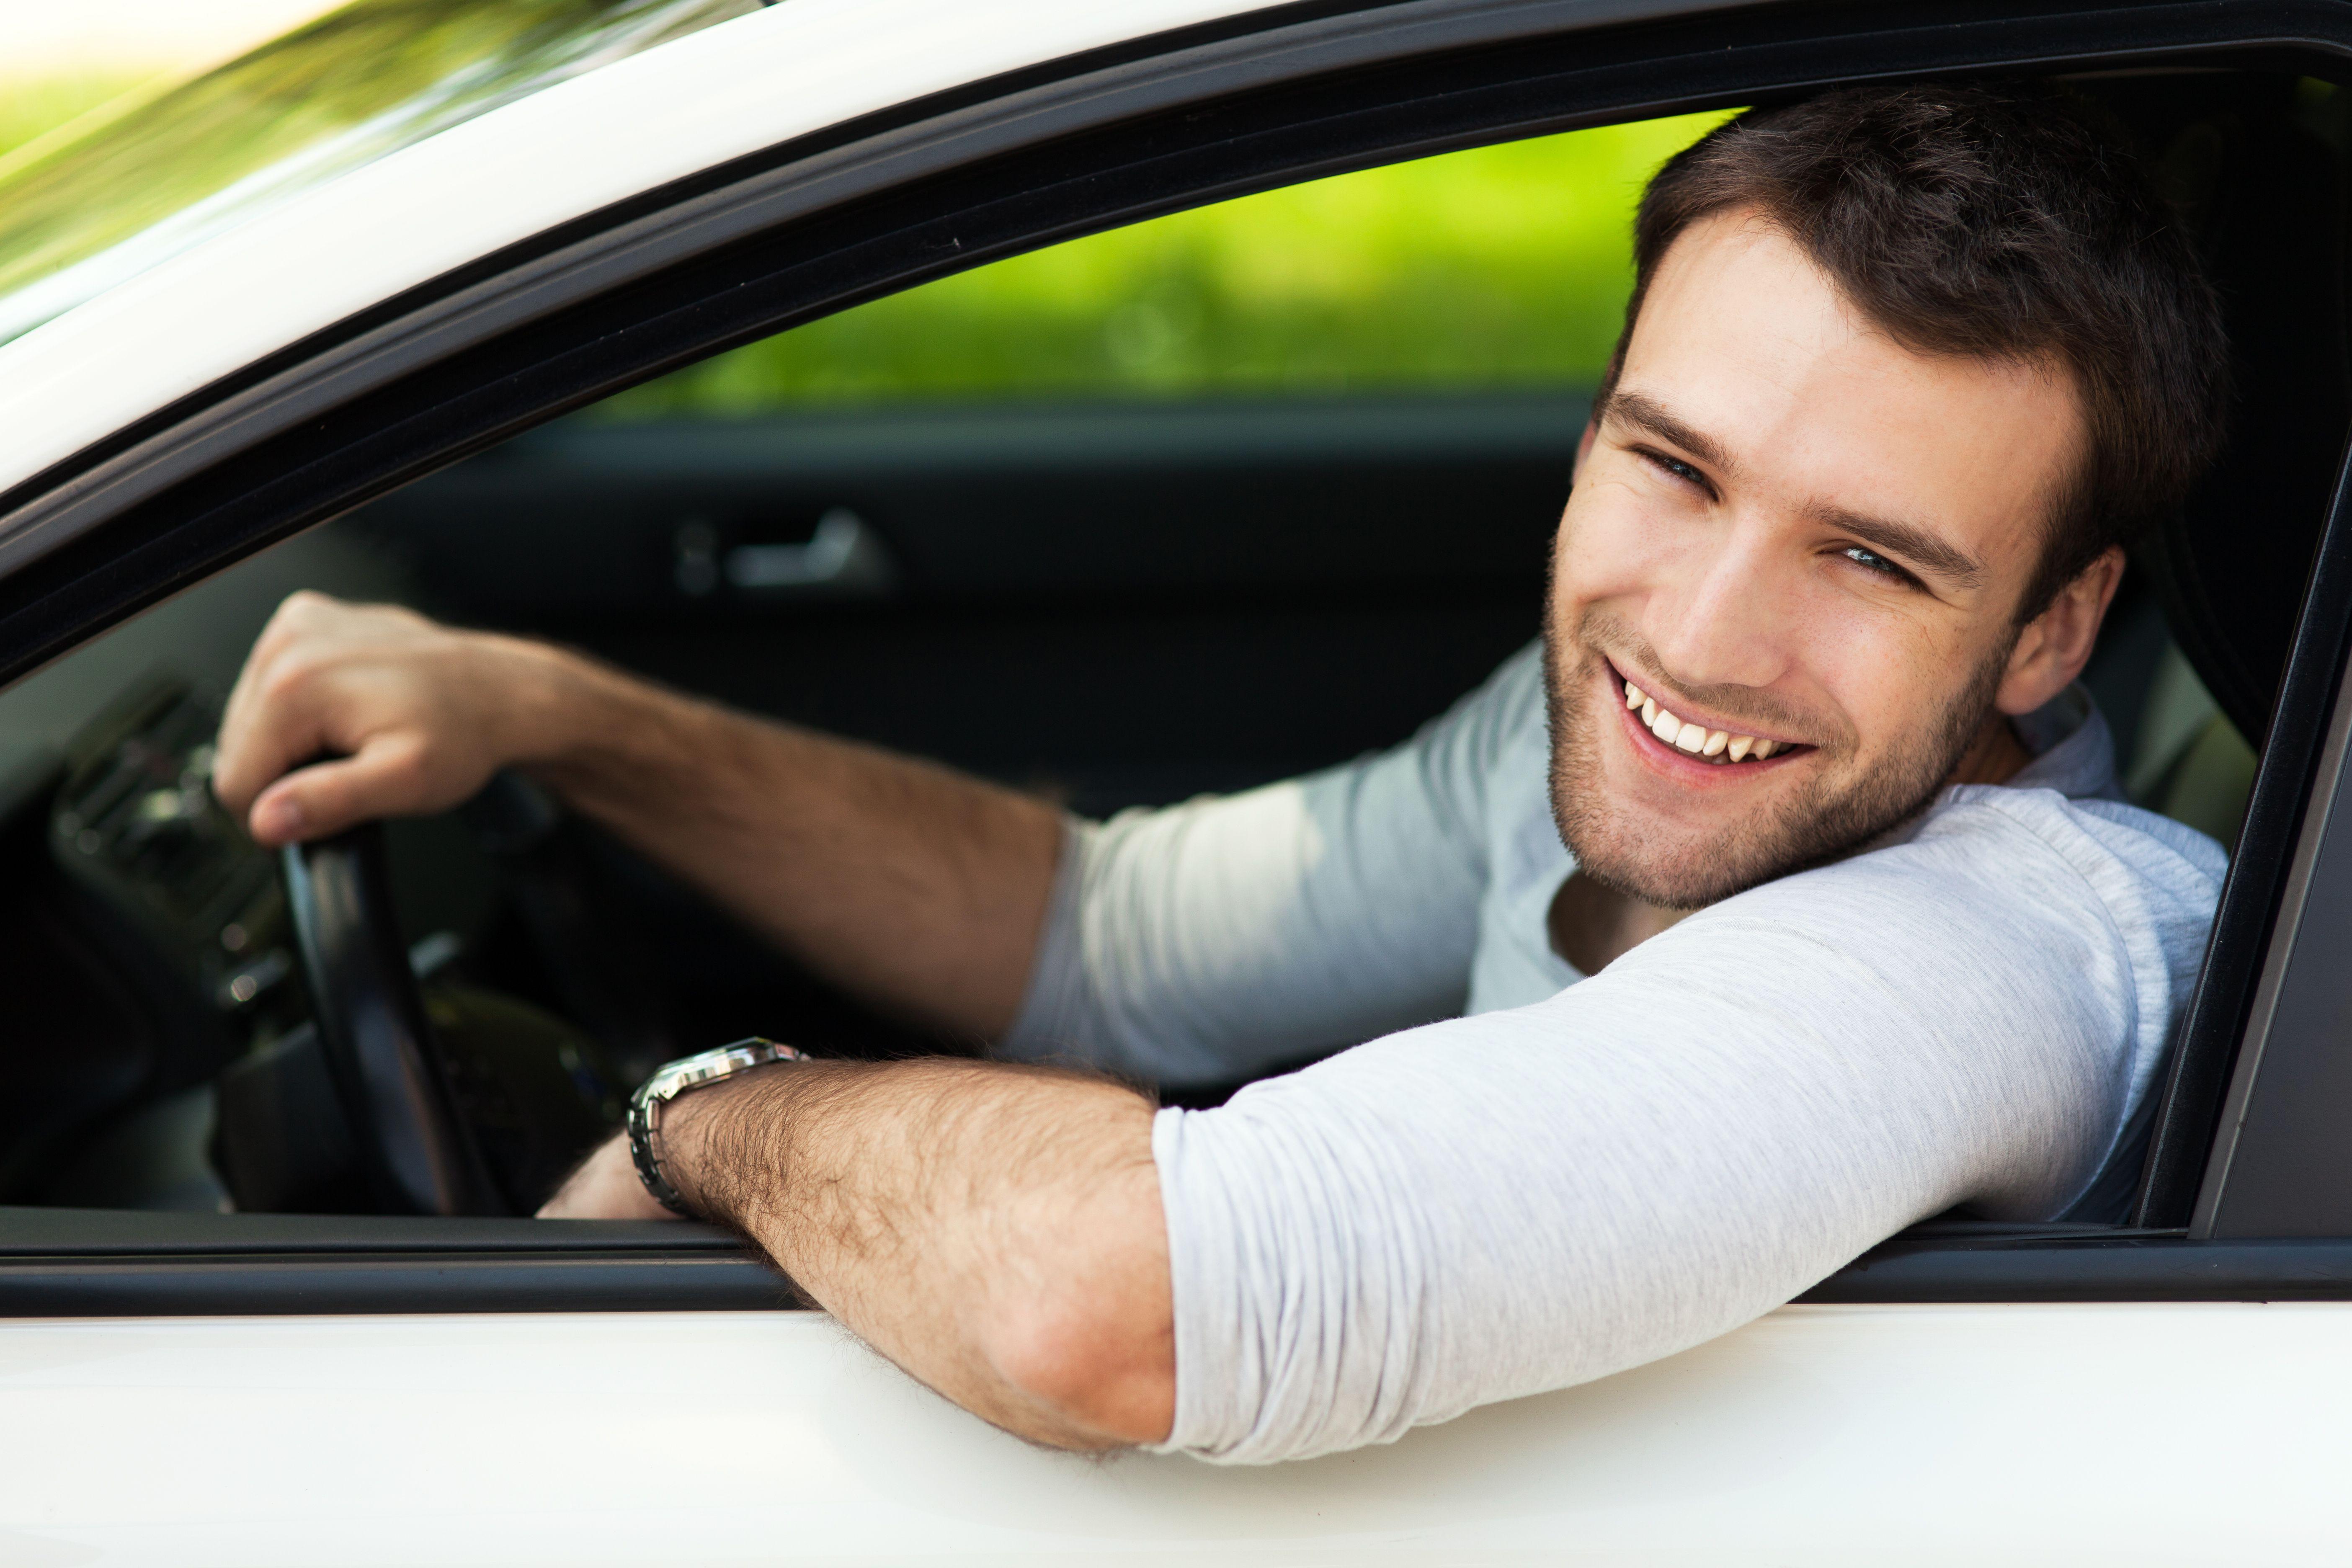 Getting Quick Cash for Car Title Loans in Calgary https://goo.gl/2C0zFQ #CarTitleLoans #Calgary #CarLoan